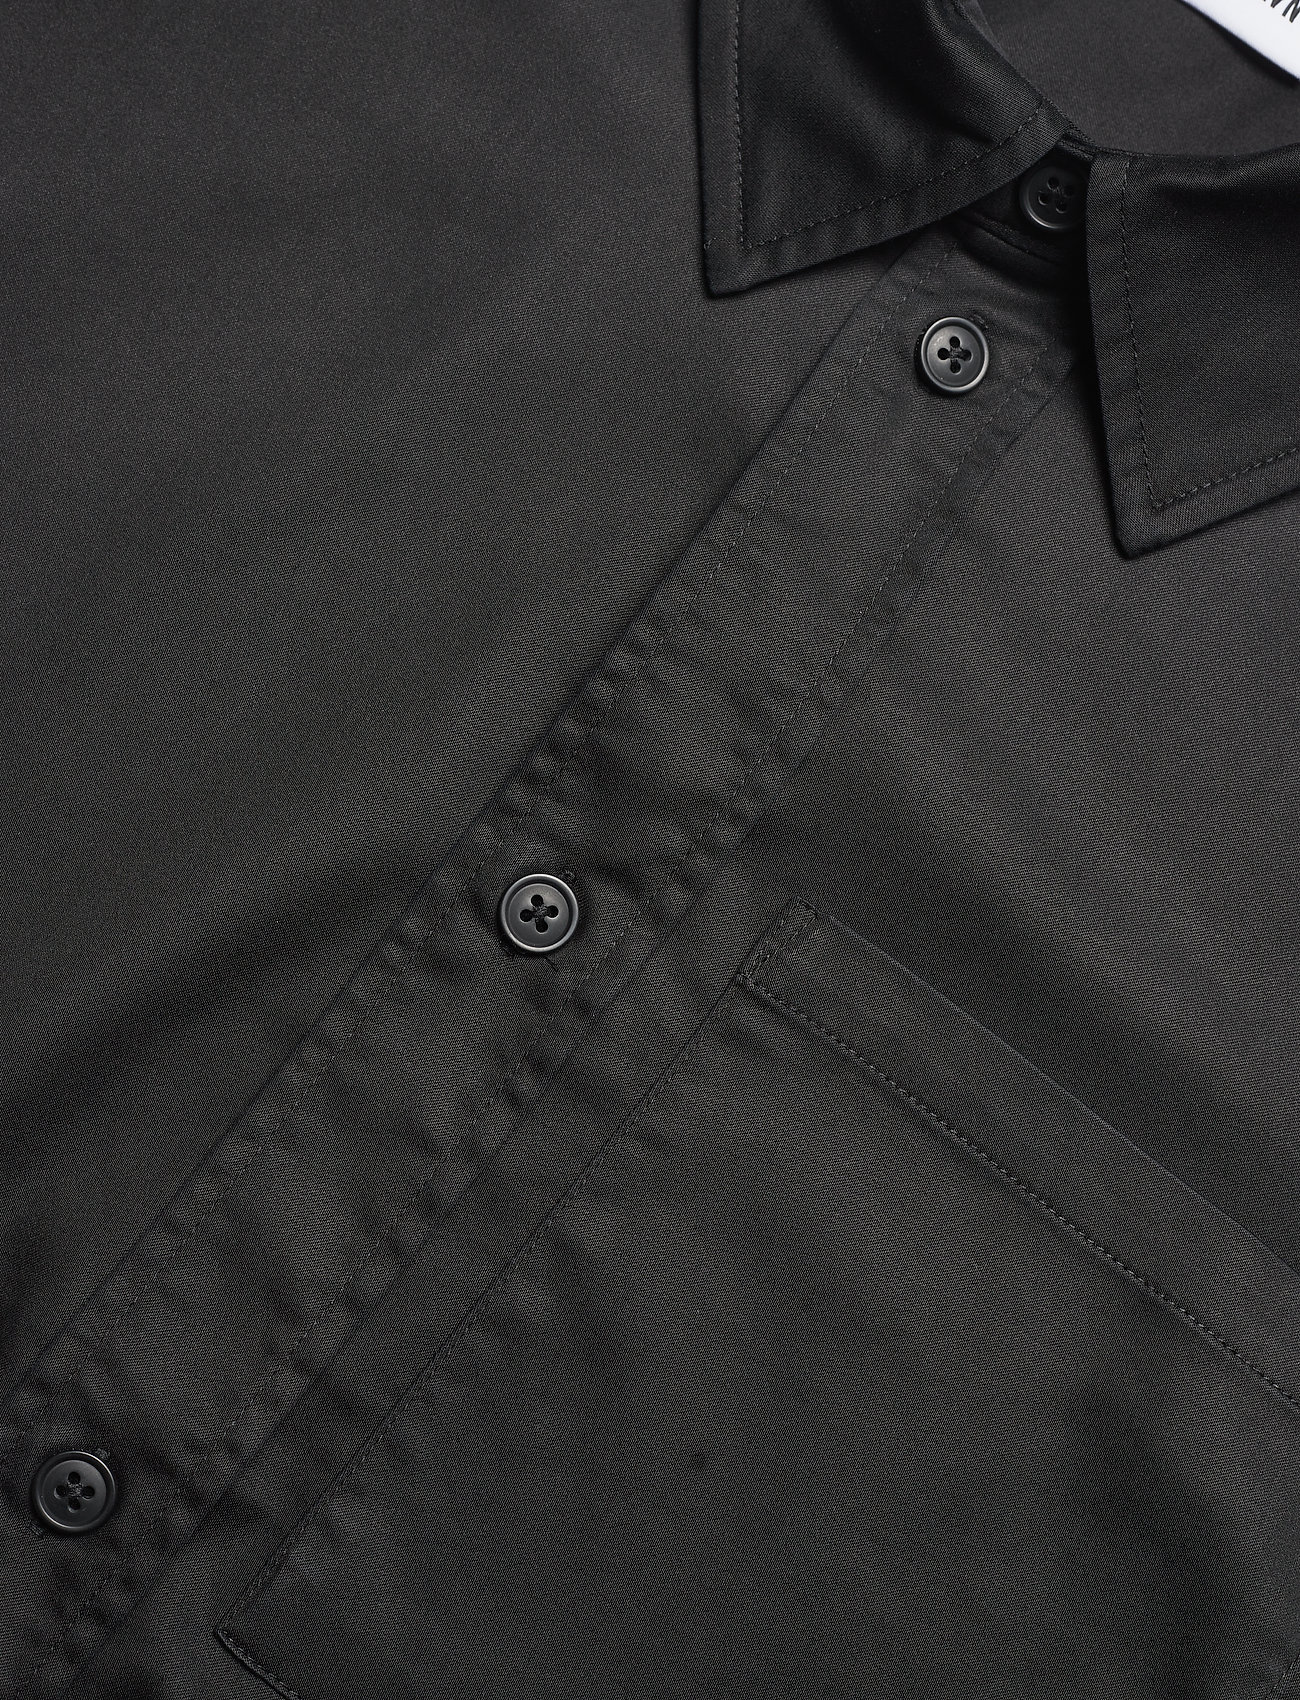 HAN Kjøbenhavn - Boxy Shirt SS - oxford overhemden - black - 4